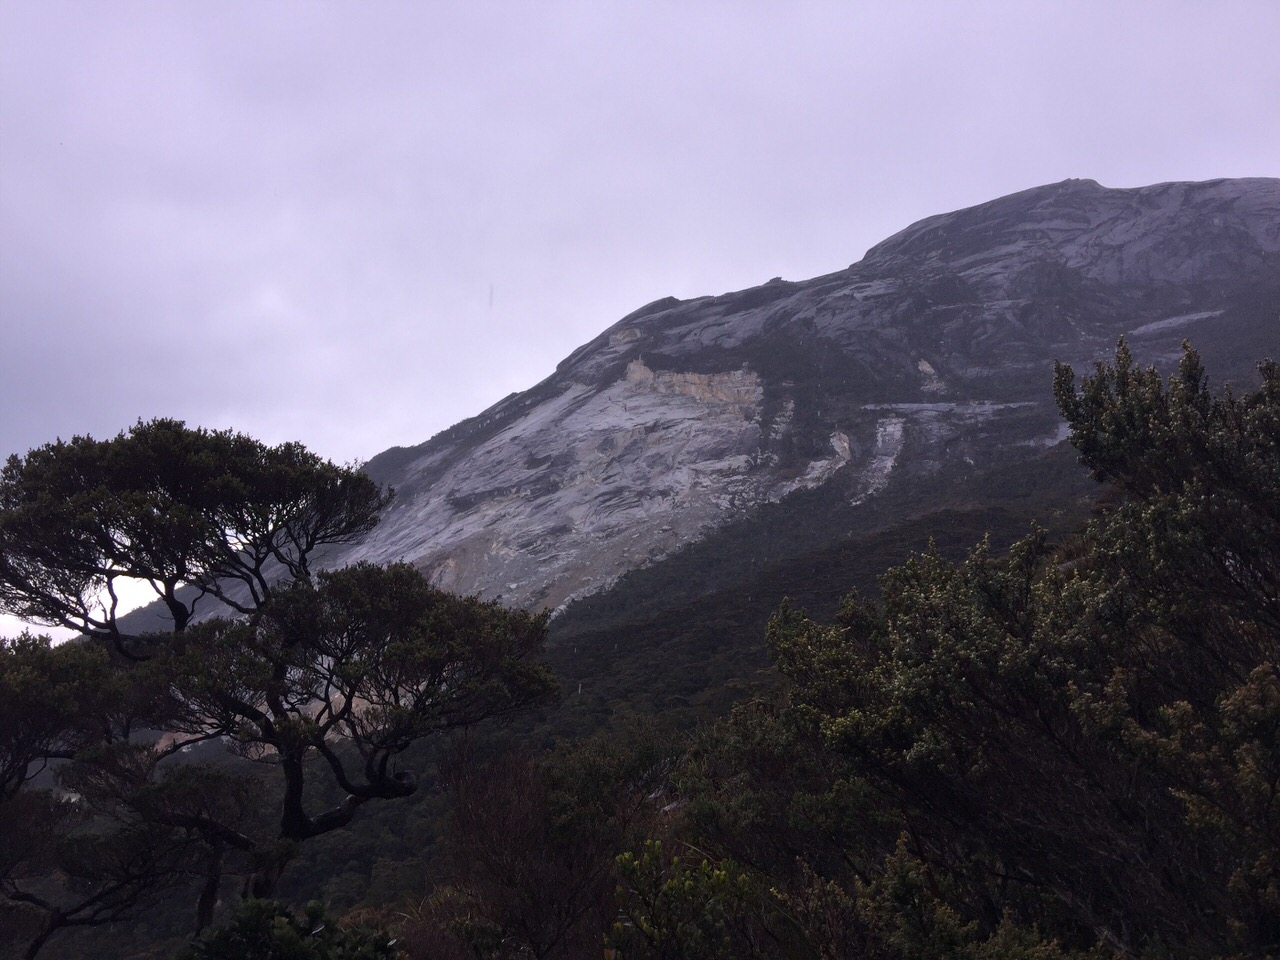 Kota Kinabalu climbing 4077